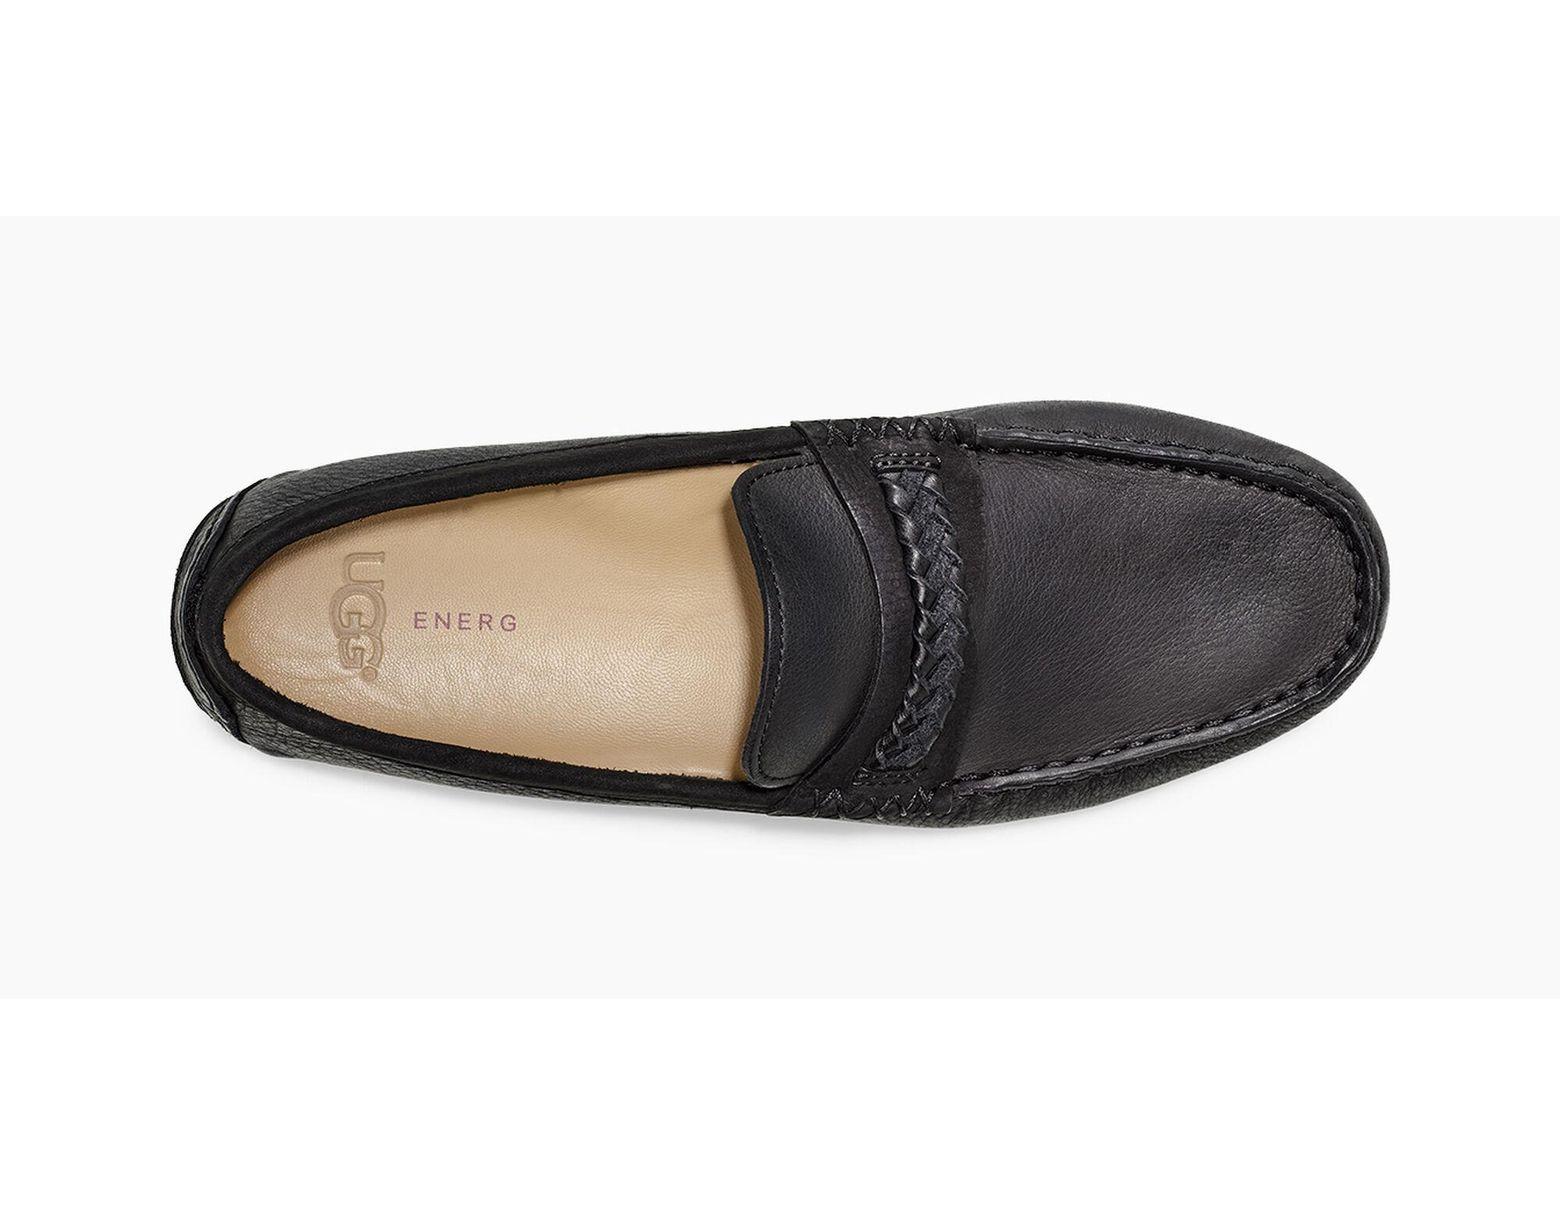 6986a8321bc UGG Henrick Leather Braid Henrick Leather Braid in Black for Men - Lyst